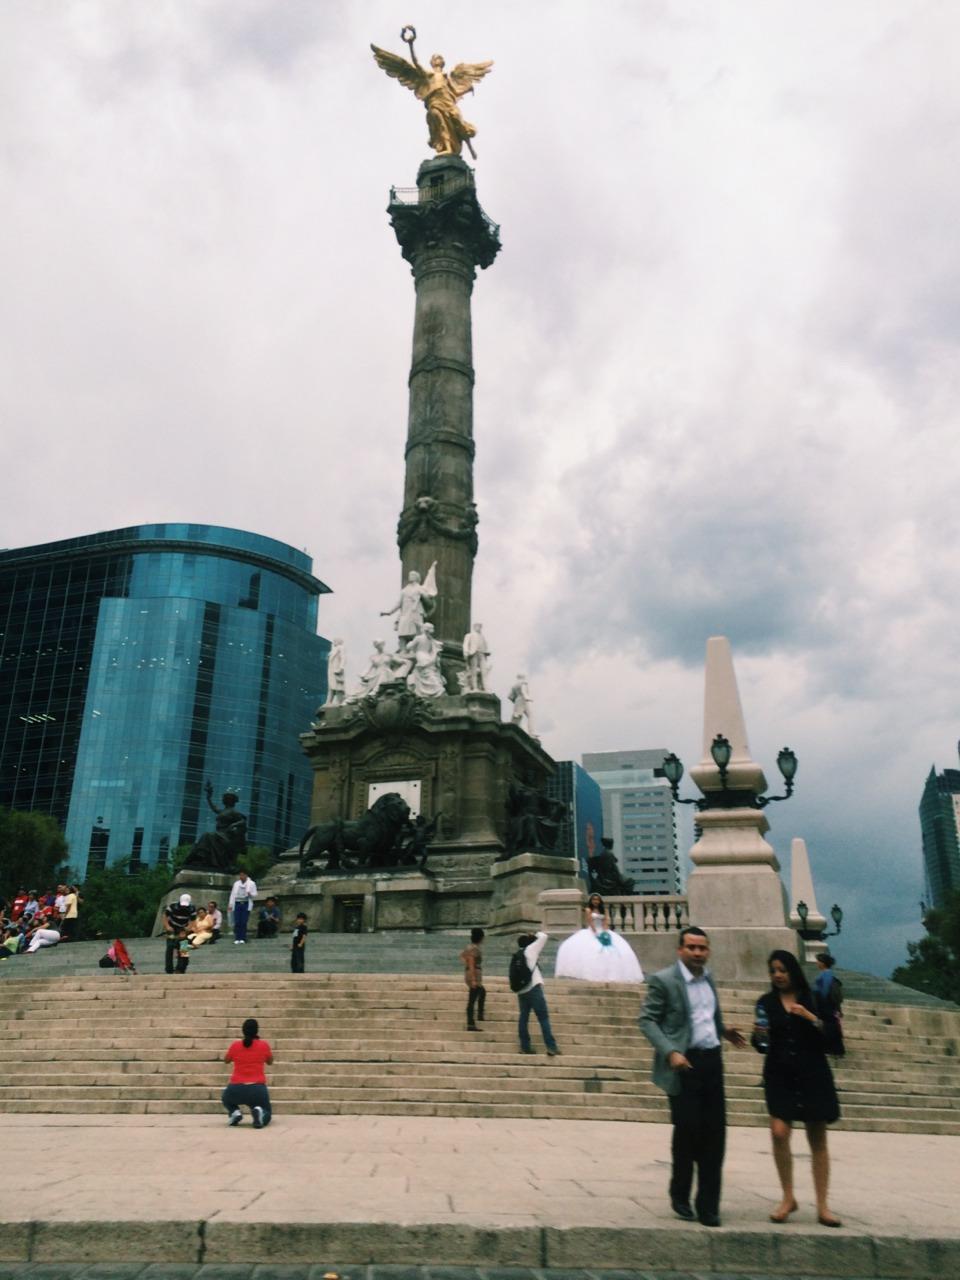 A quinceñera gets her picture taken. I front of El Angel del Indenpidencia.